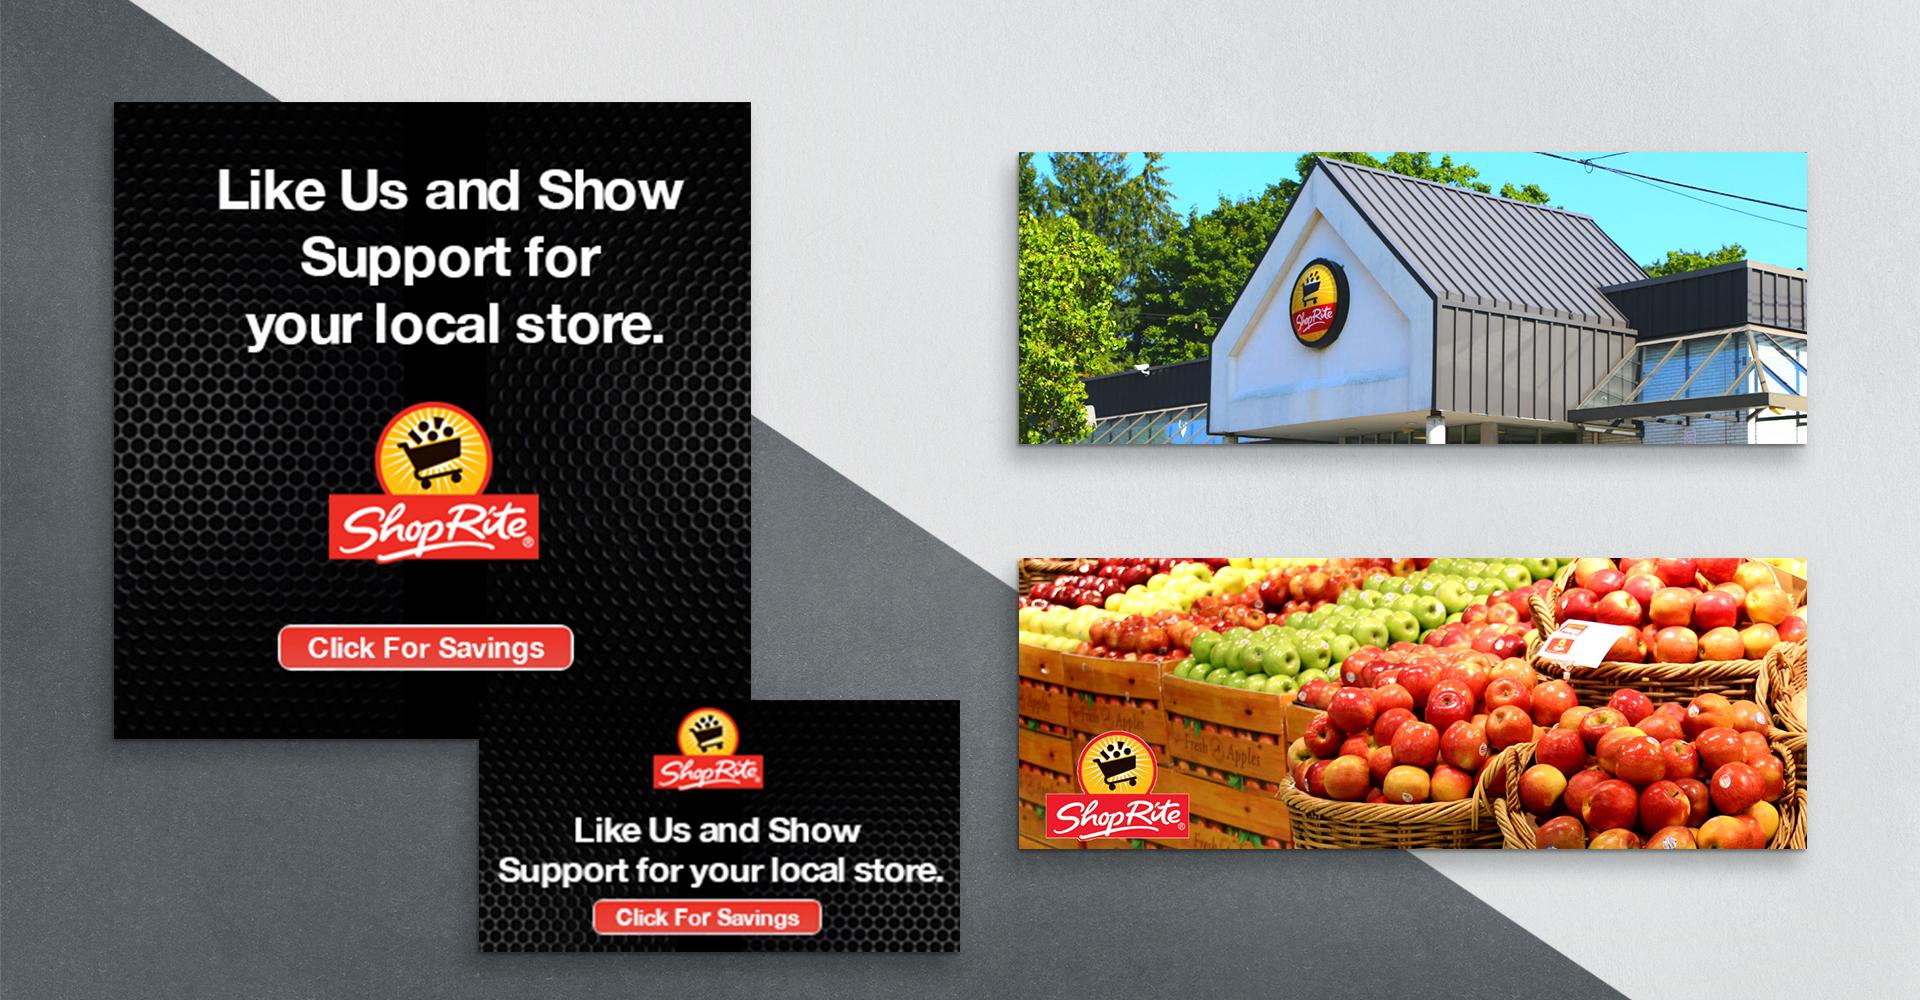 ShopRite digital display